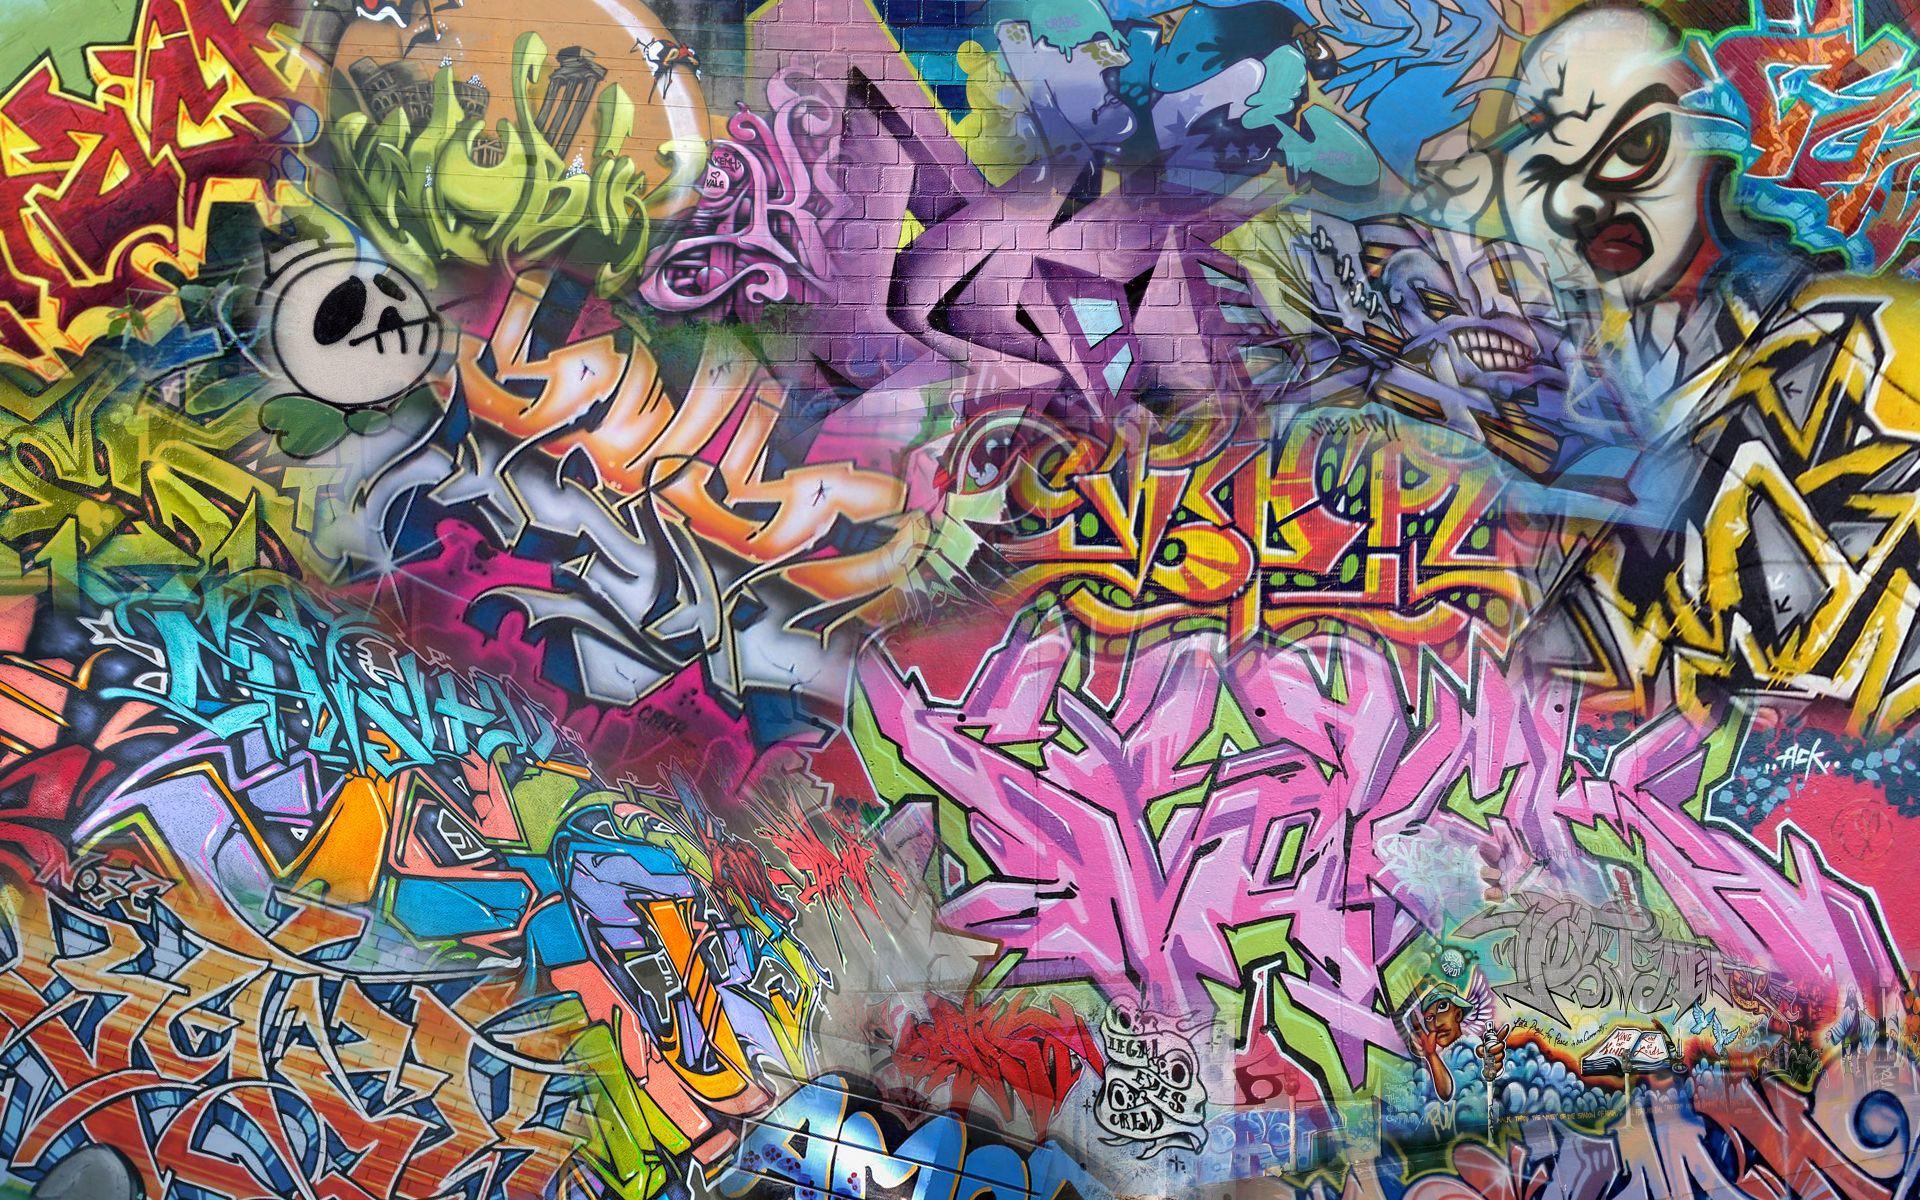 1024x768 v 298 street art wallpapers hd images of street art ultra hd 4k